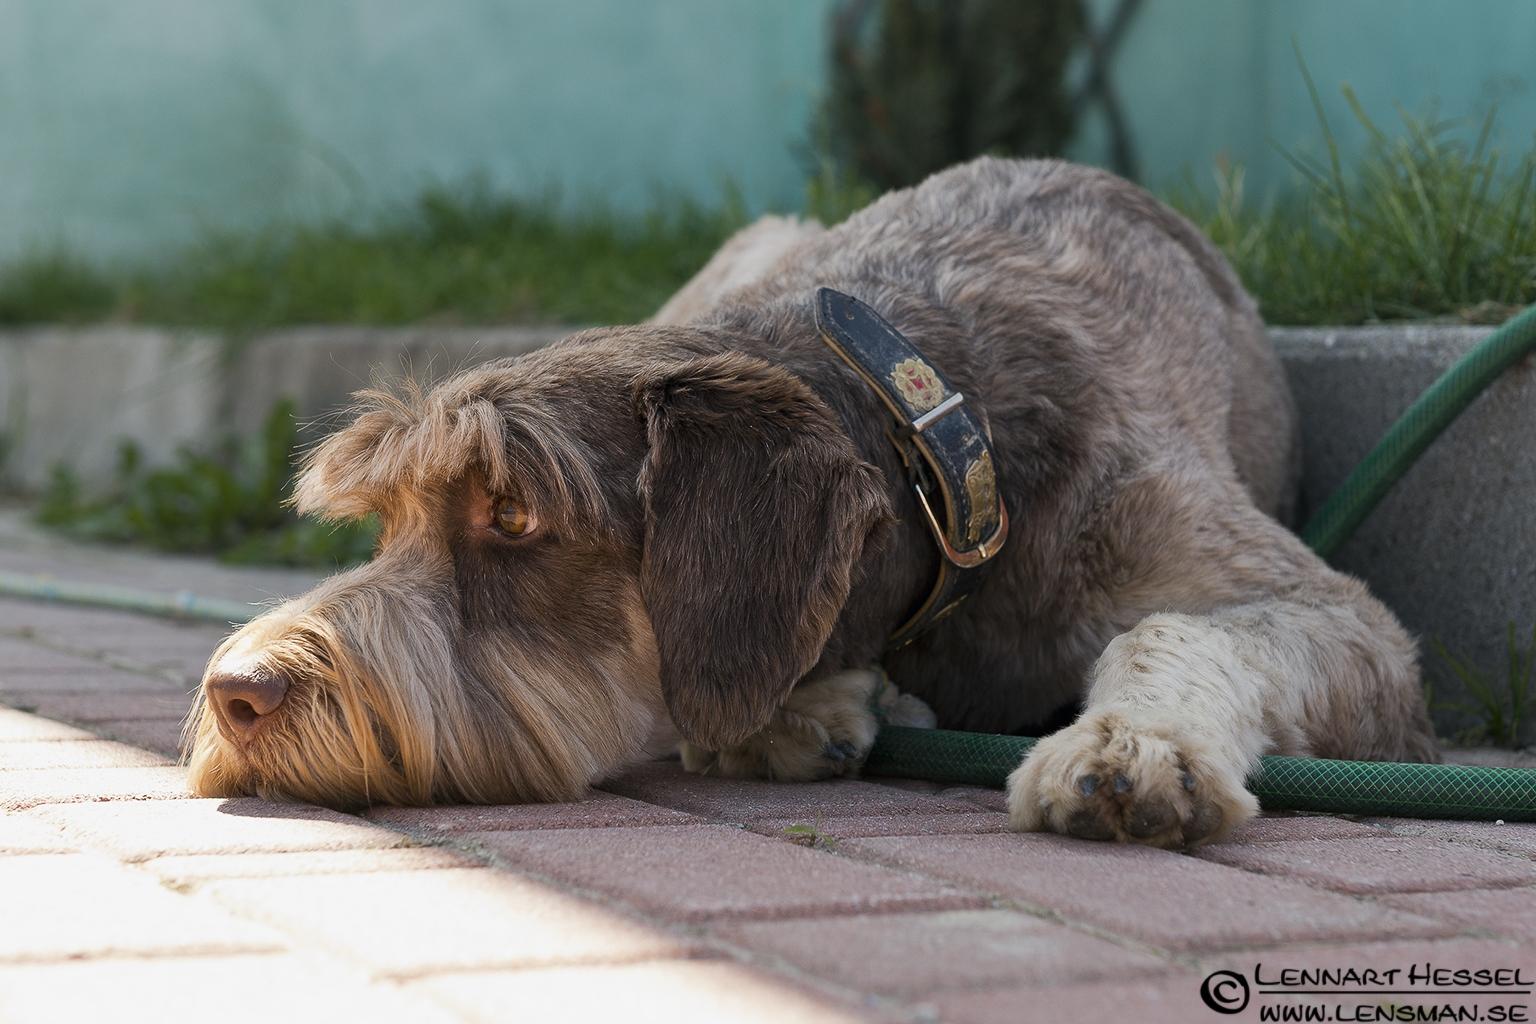 Argo resting in Piedmont, Italy